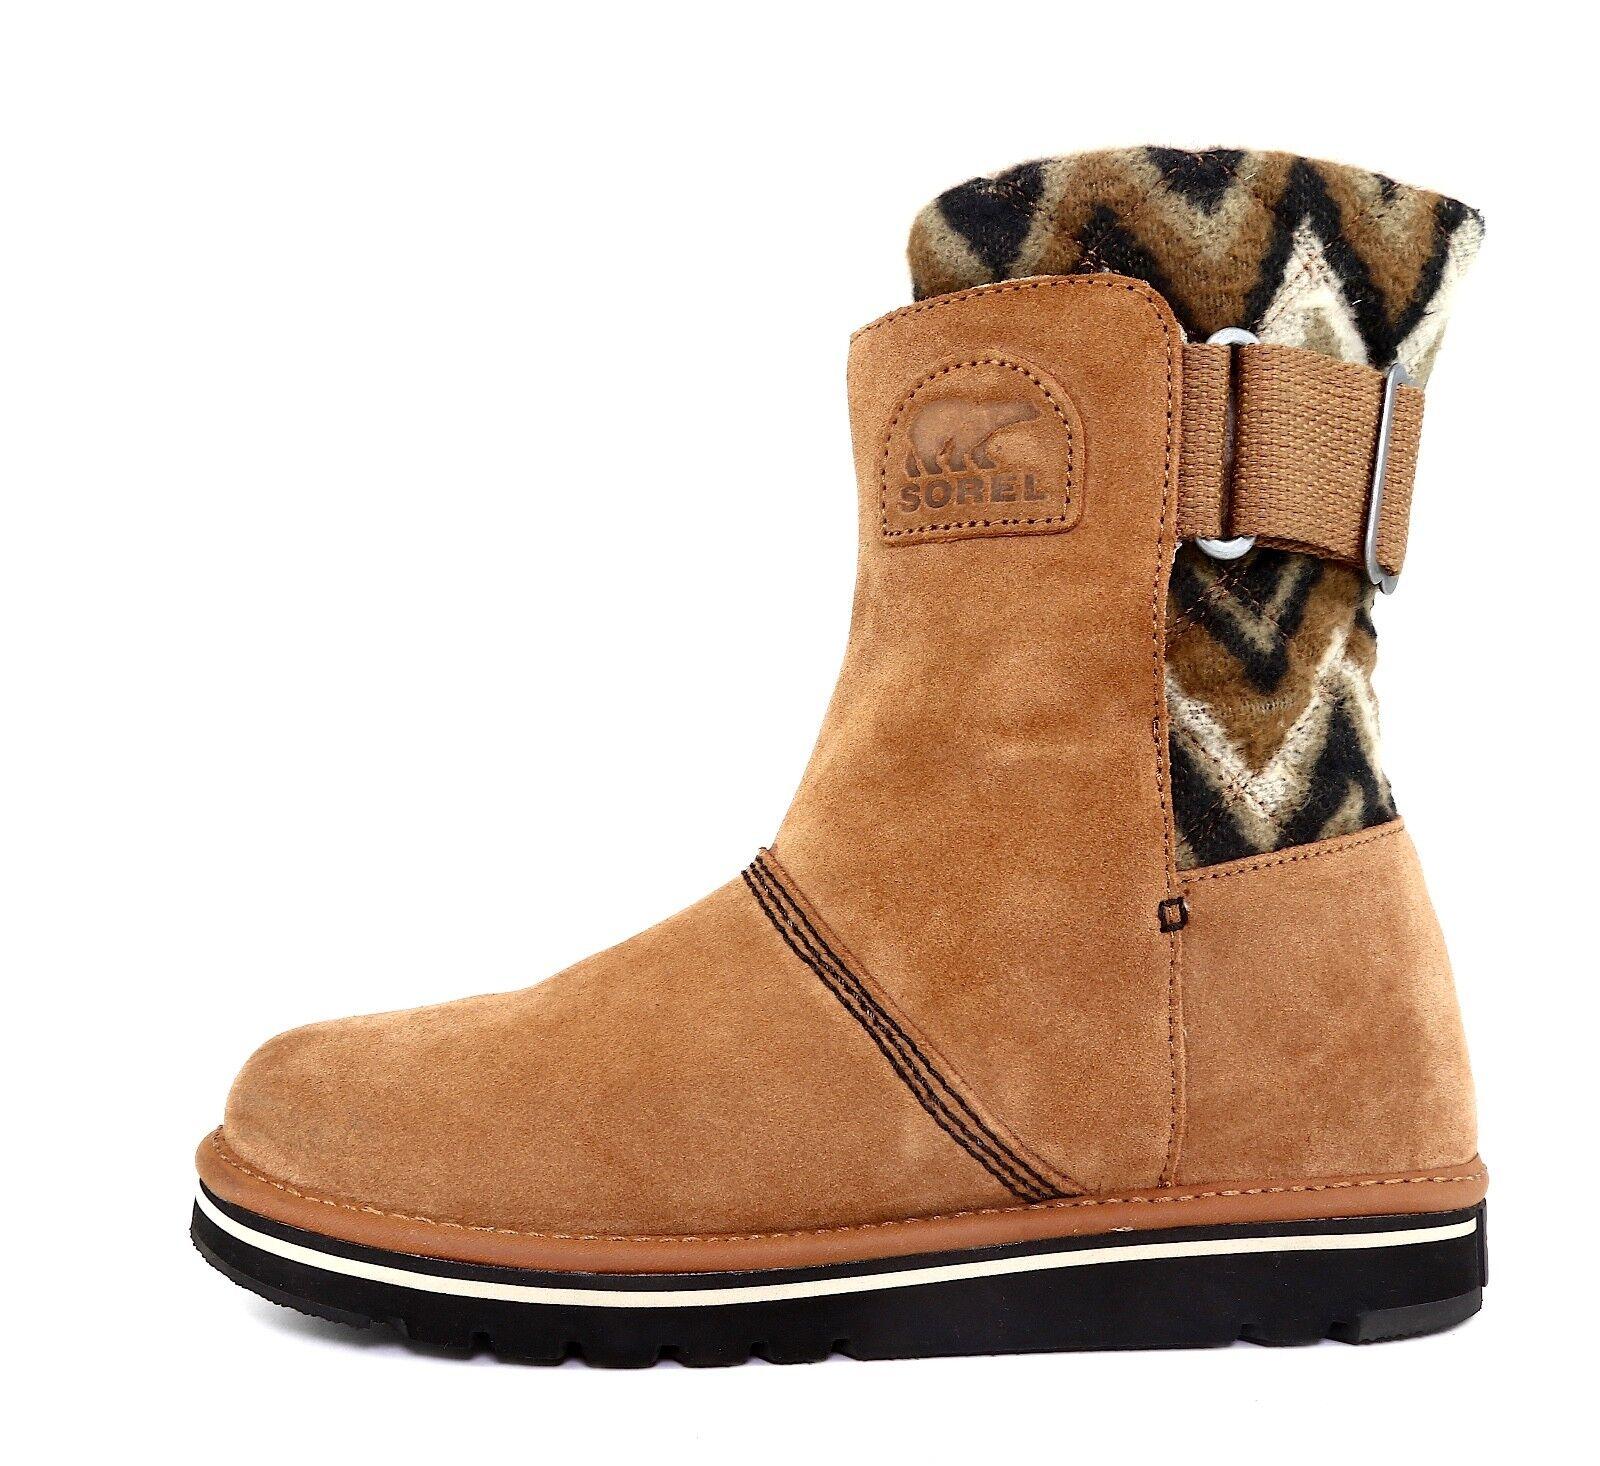 SOREL The Newbie Suede Boot Brown Women Sz 9 5531